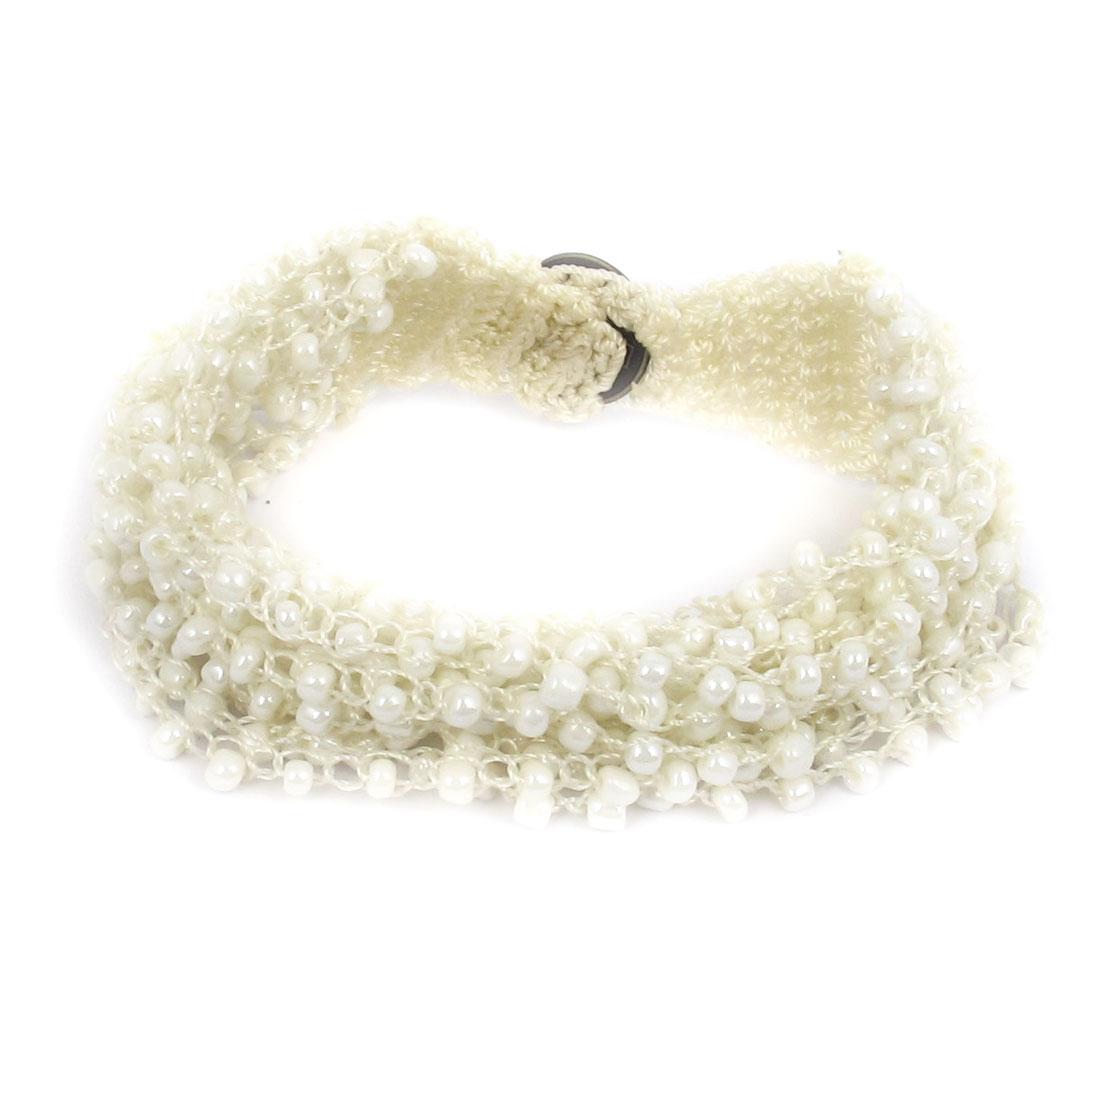 Women National Style Plastic Beaded Multi-layer Buttoned Bangle Bracelet Beige